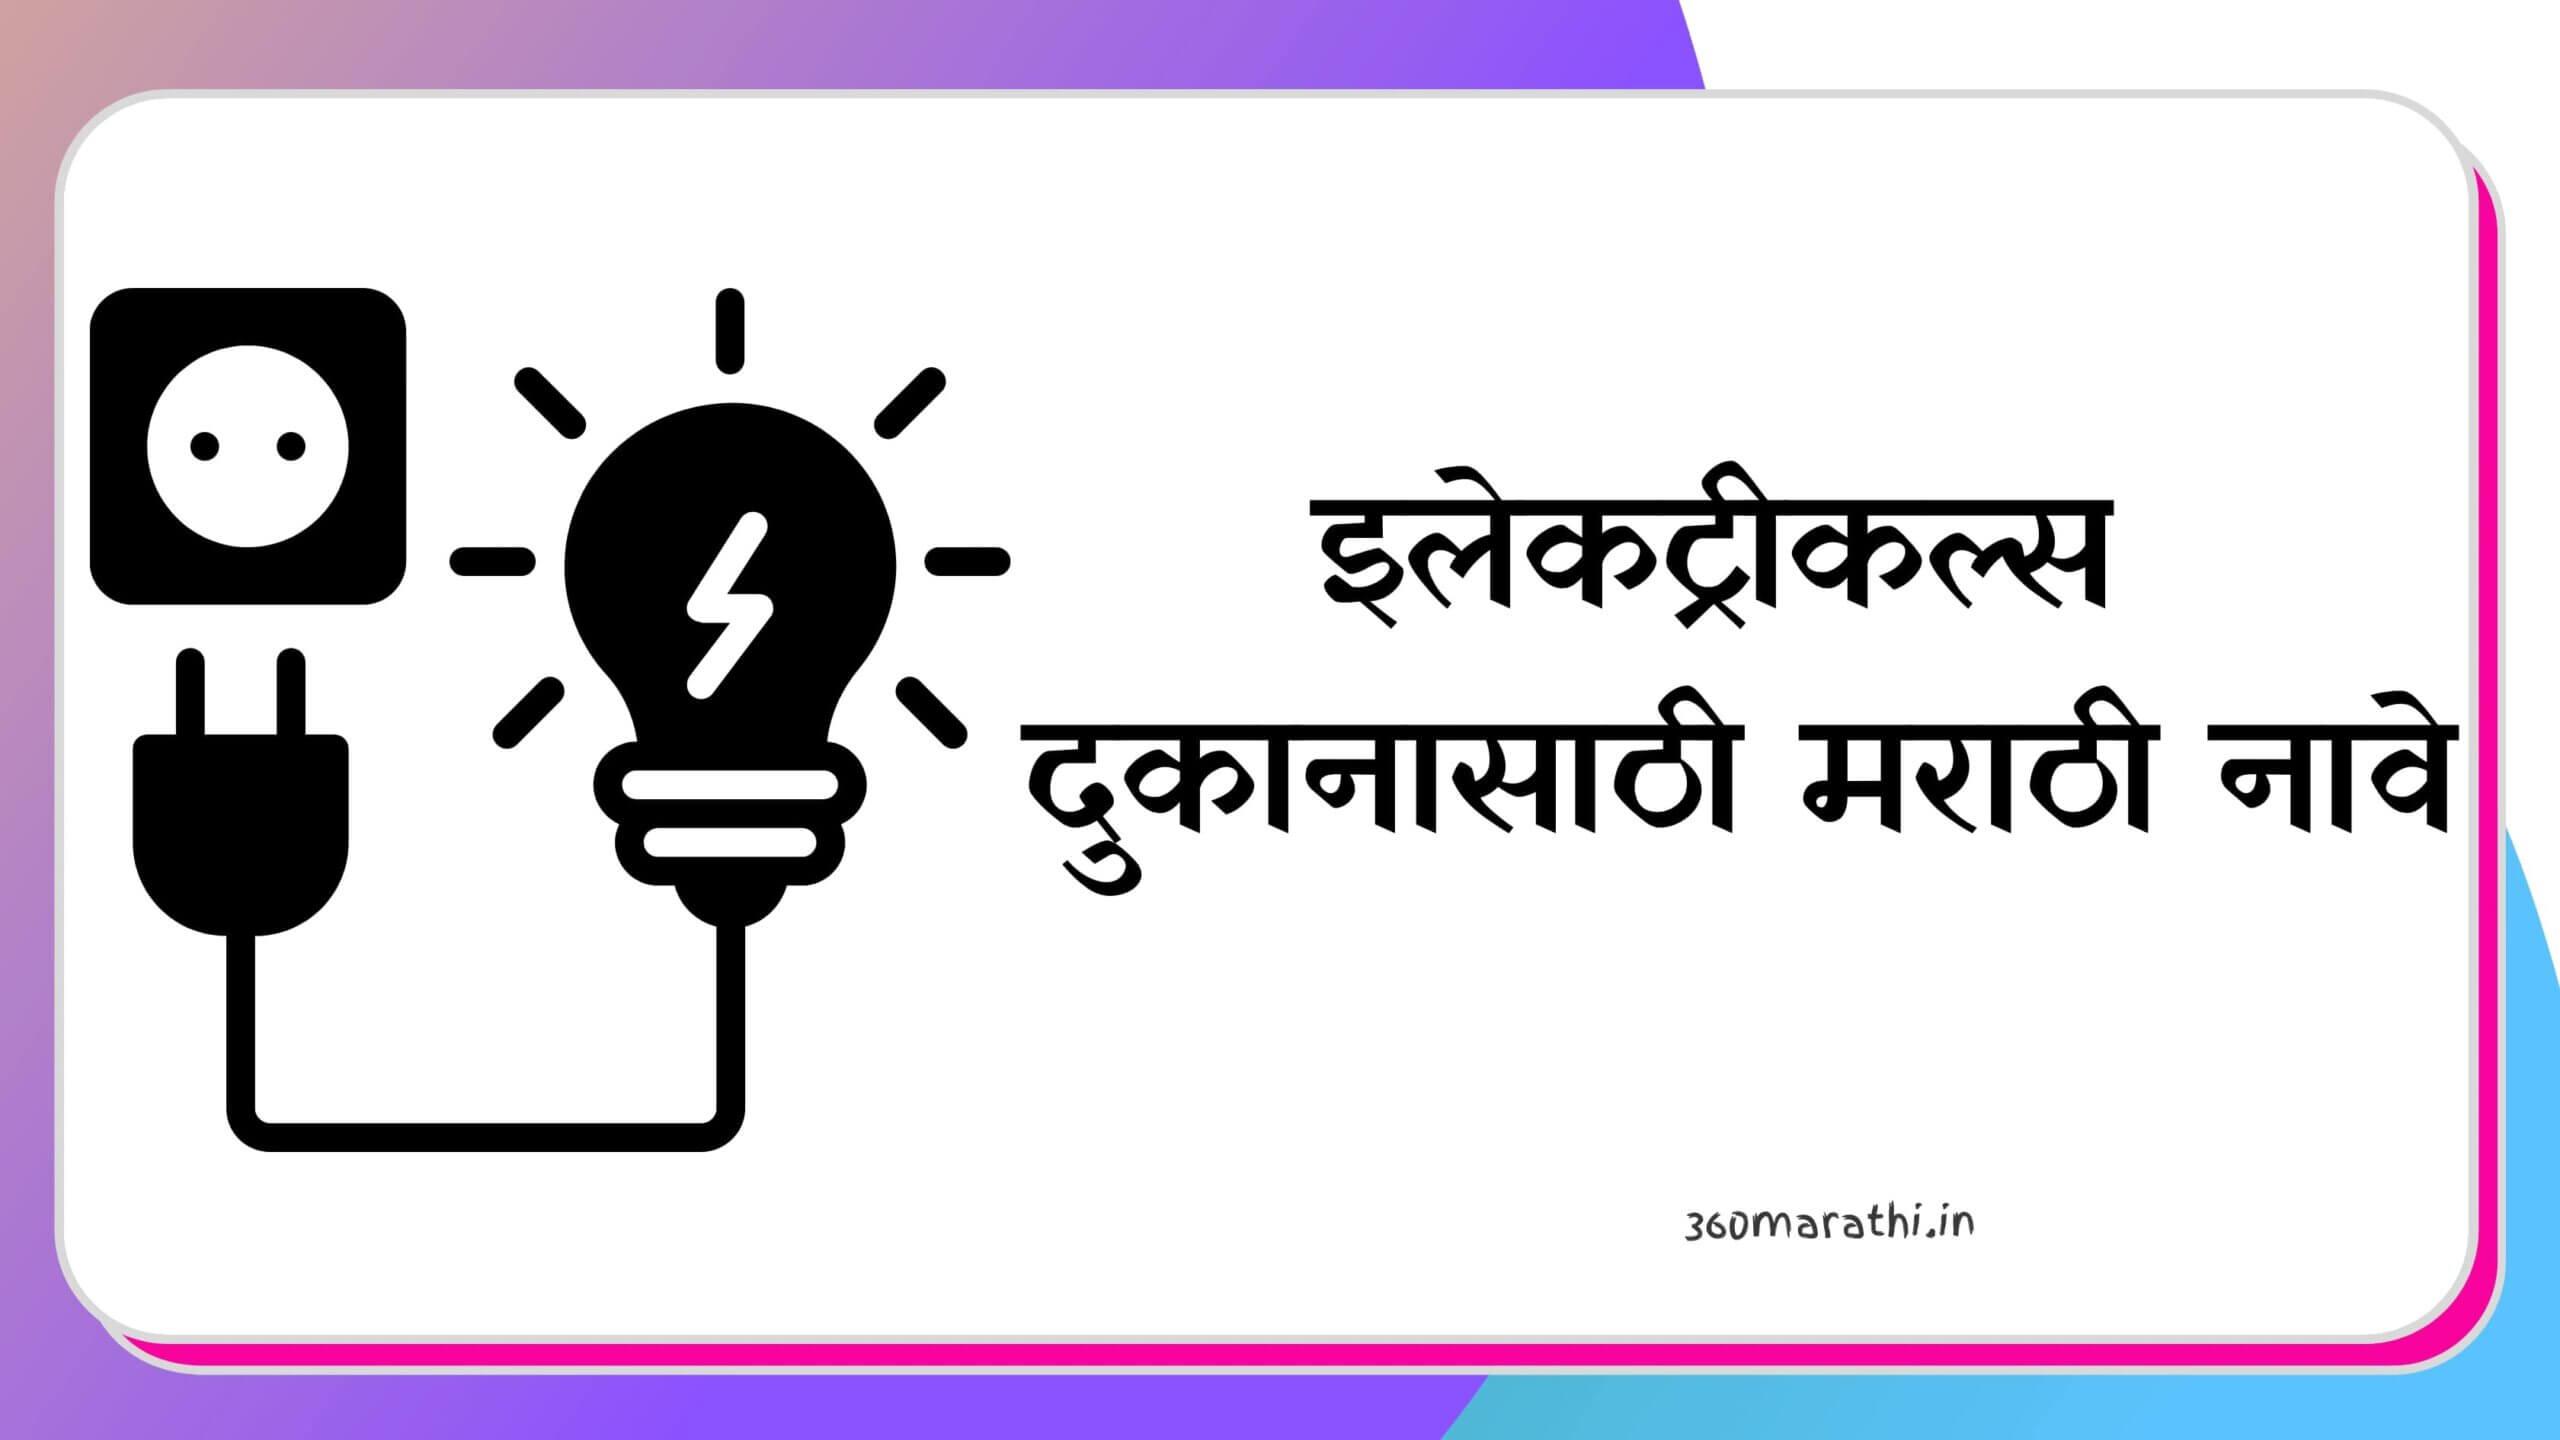 १२०+ इलेकट्रीकल्स दुकानासाठी मराठी नावे | Marathi Names for Electrical Shop | New Electricals Shop name ideas in Marathi